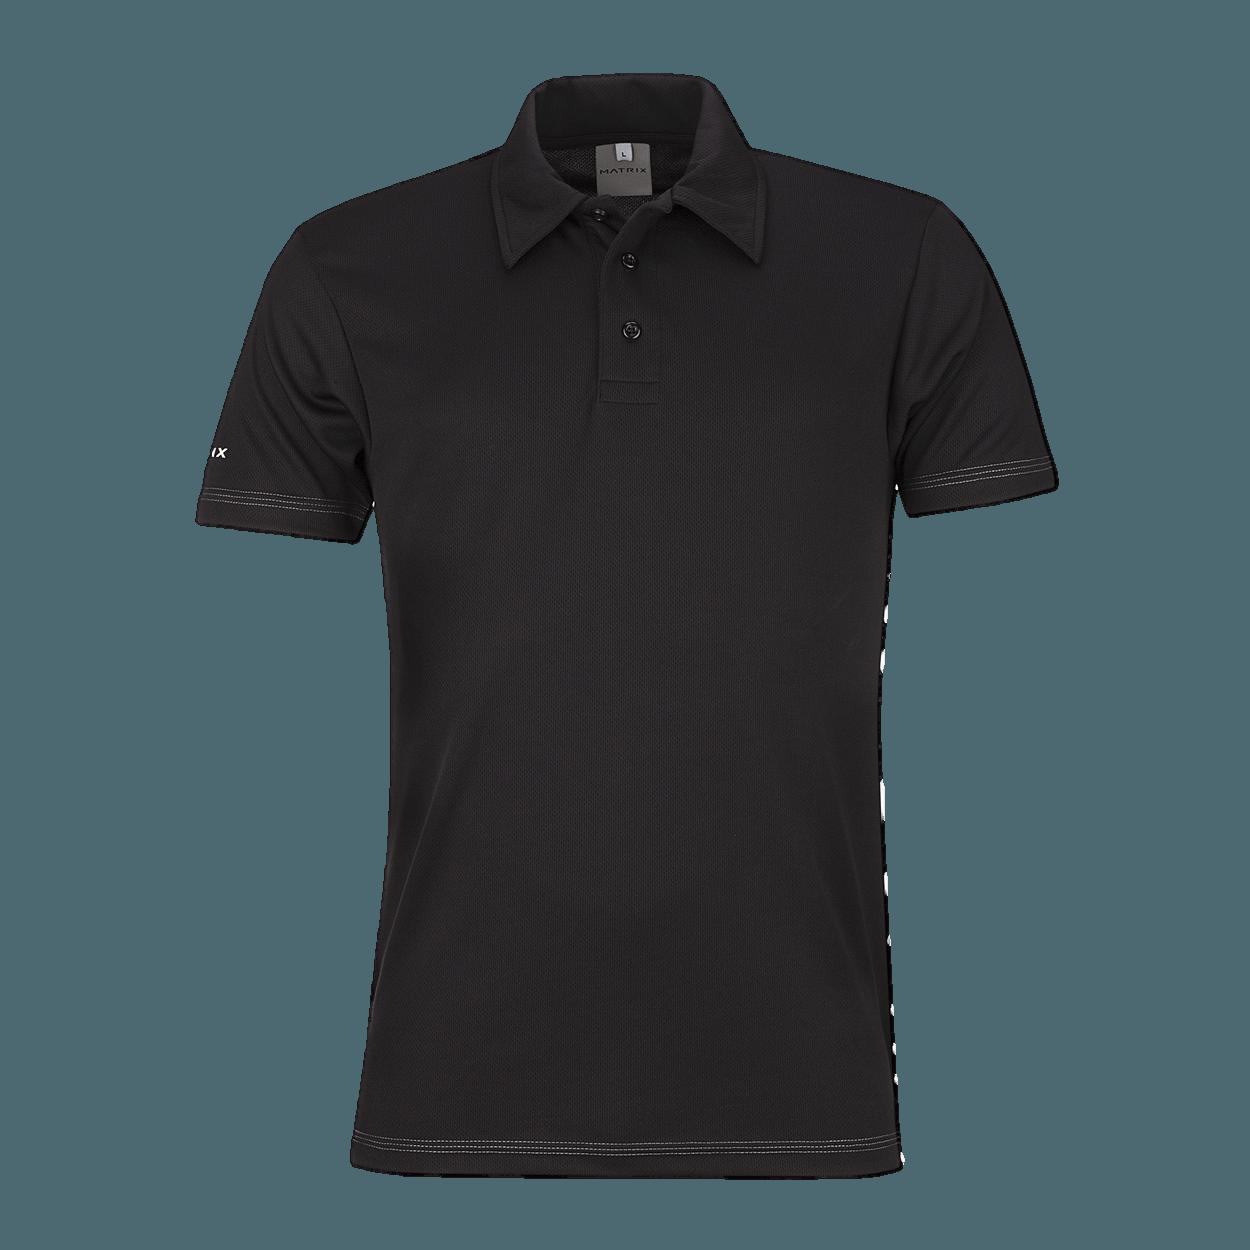 Poloshirt HD PNG - 117728